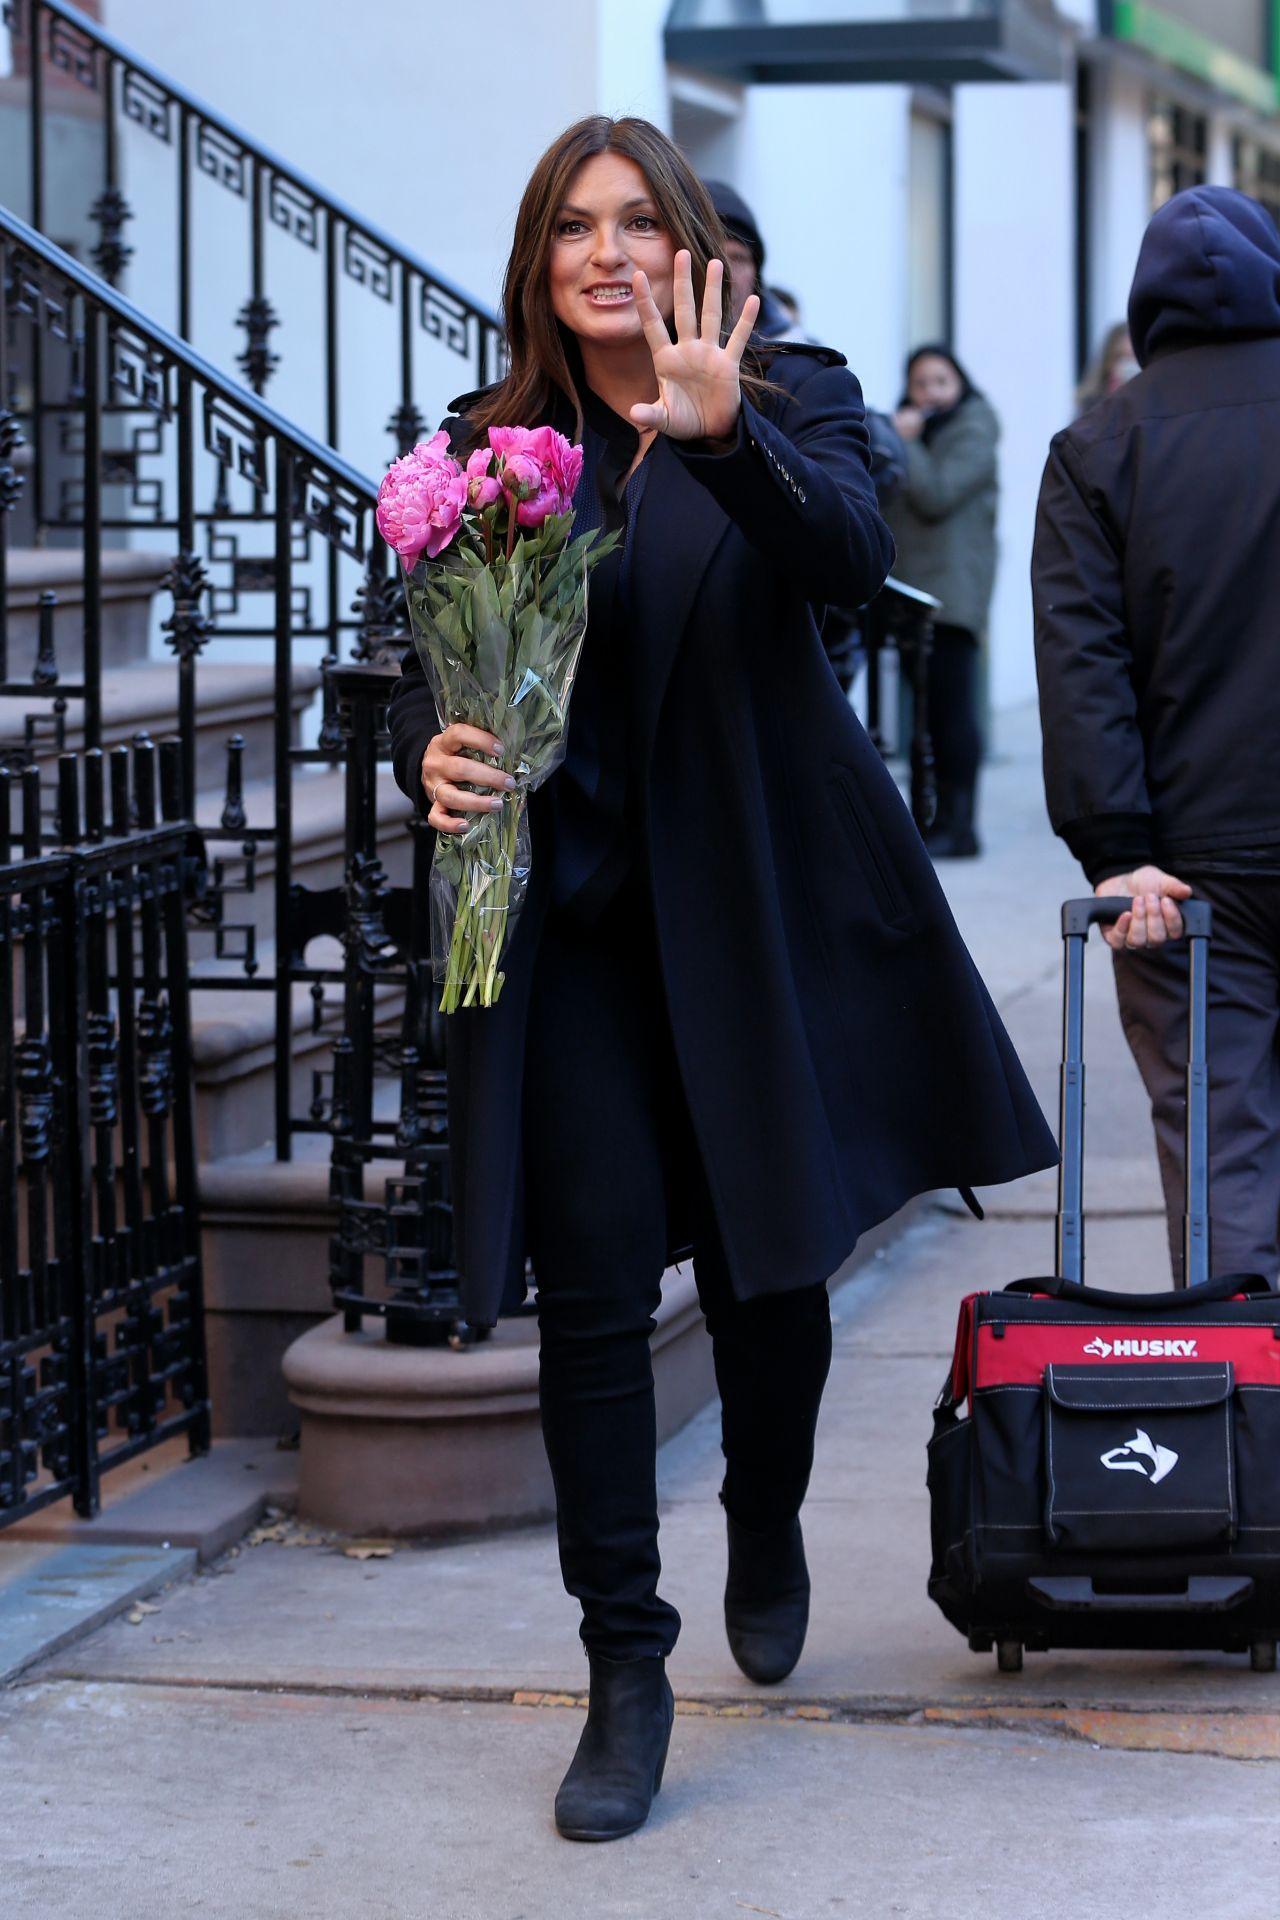 Mariska Hargitay Out In New York City 1 21 2016